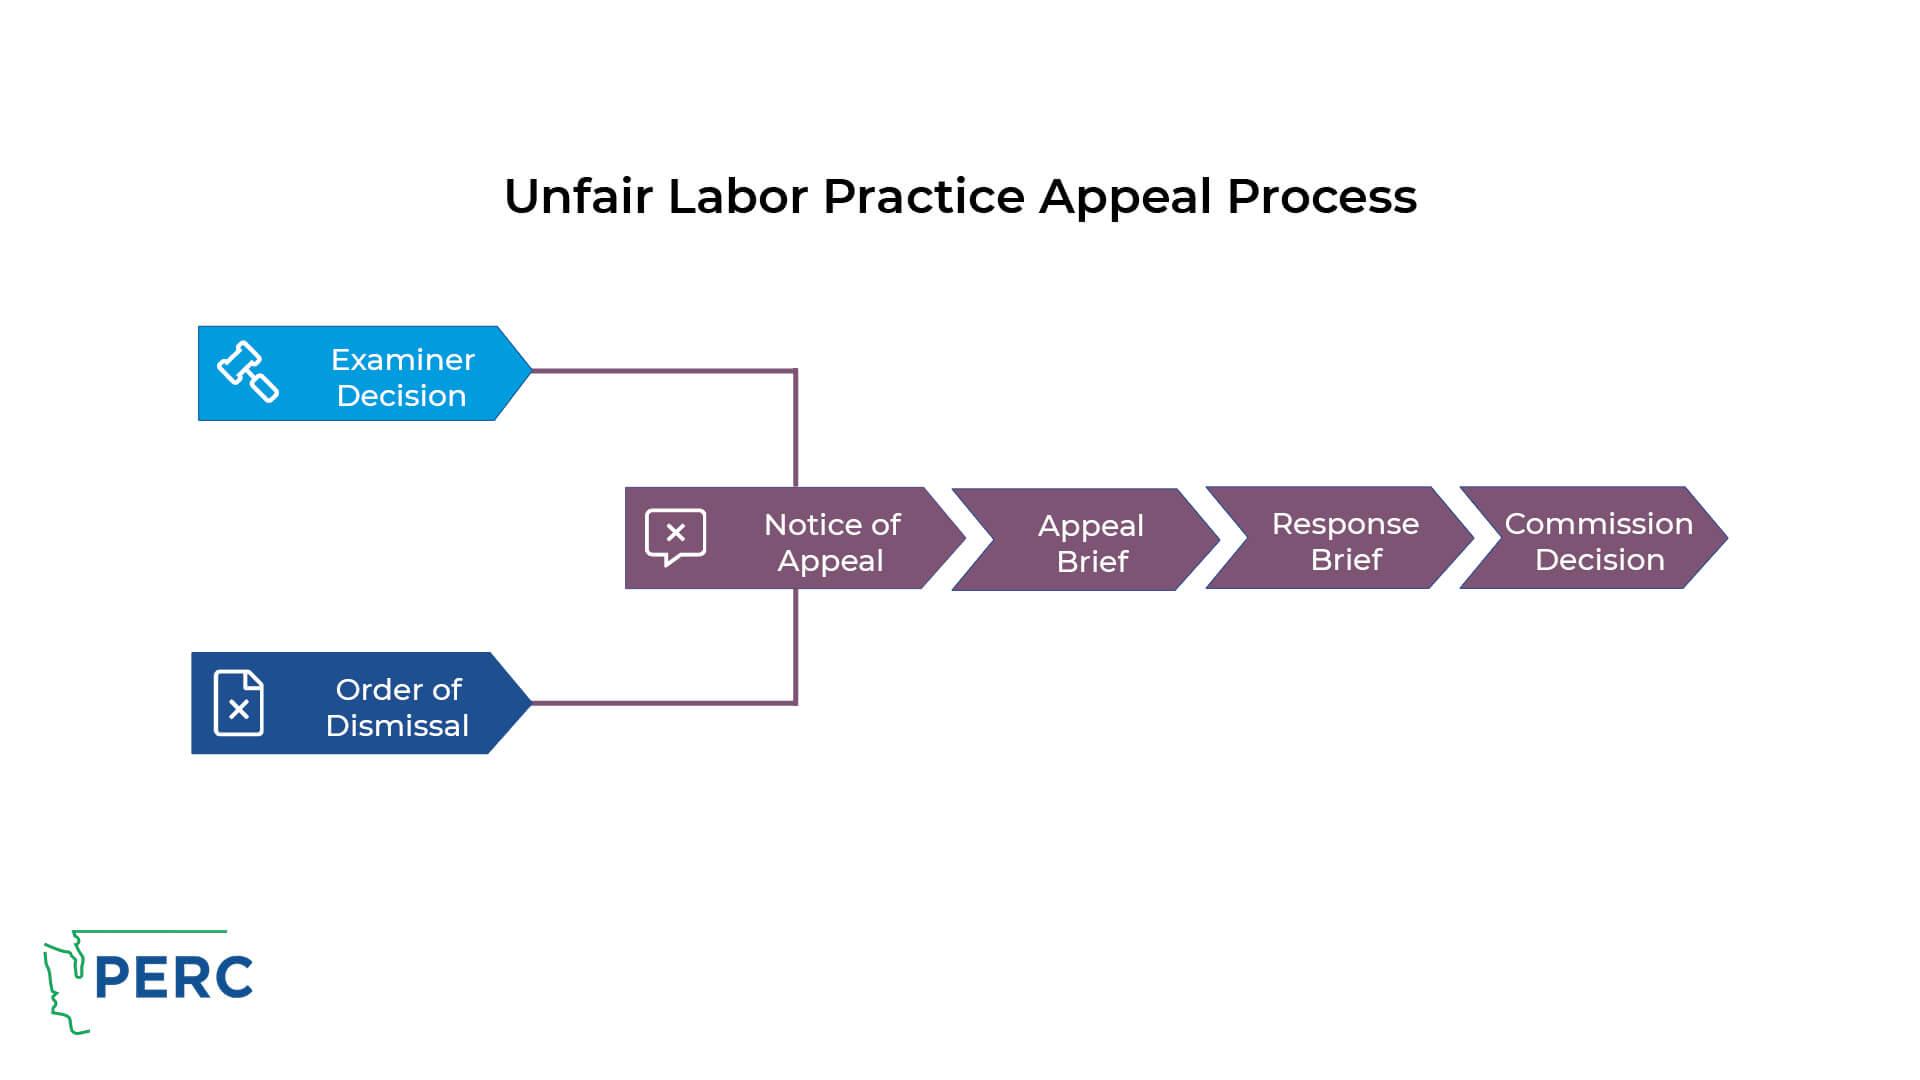 ULP Appeal Process